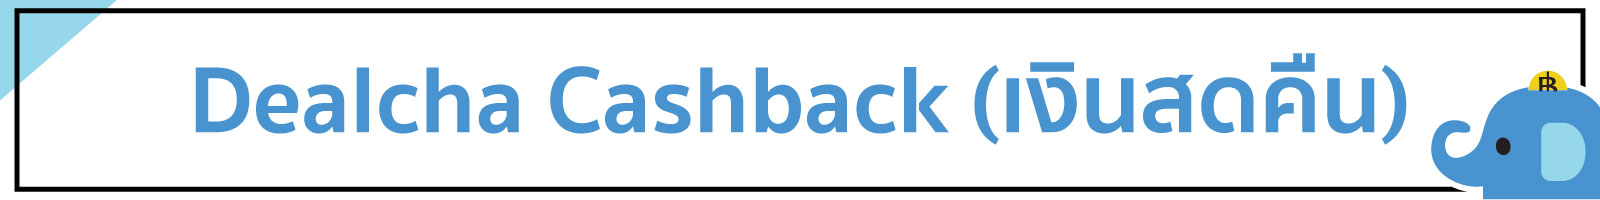 dealcha-cashback-%e0%b9%80%e0%b8%87%e0%b8%b4%e0%b8%99%e0%b8%aa%e0%b8%94%e0%b8%84%e0%b8%b7%e0%b8%99